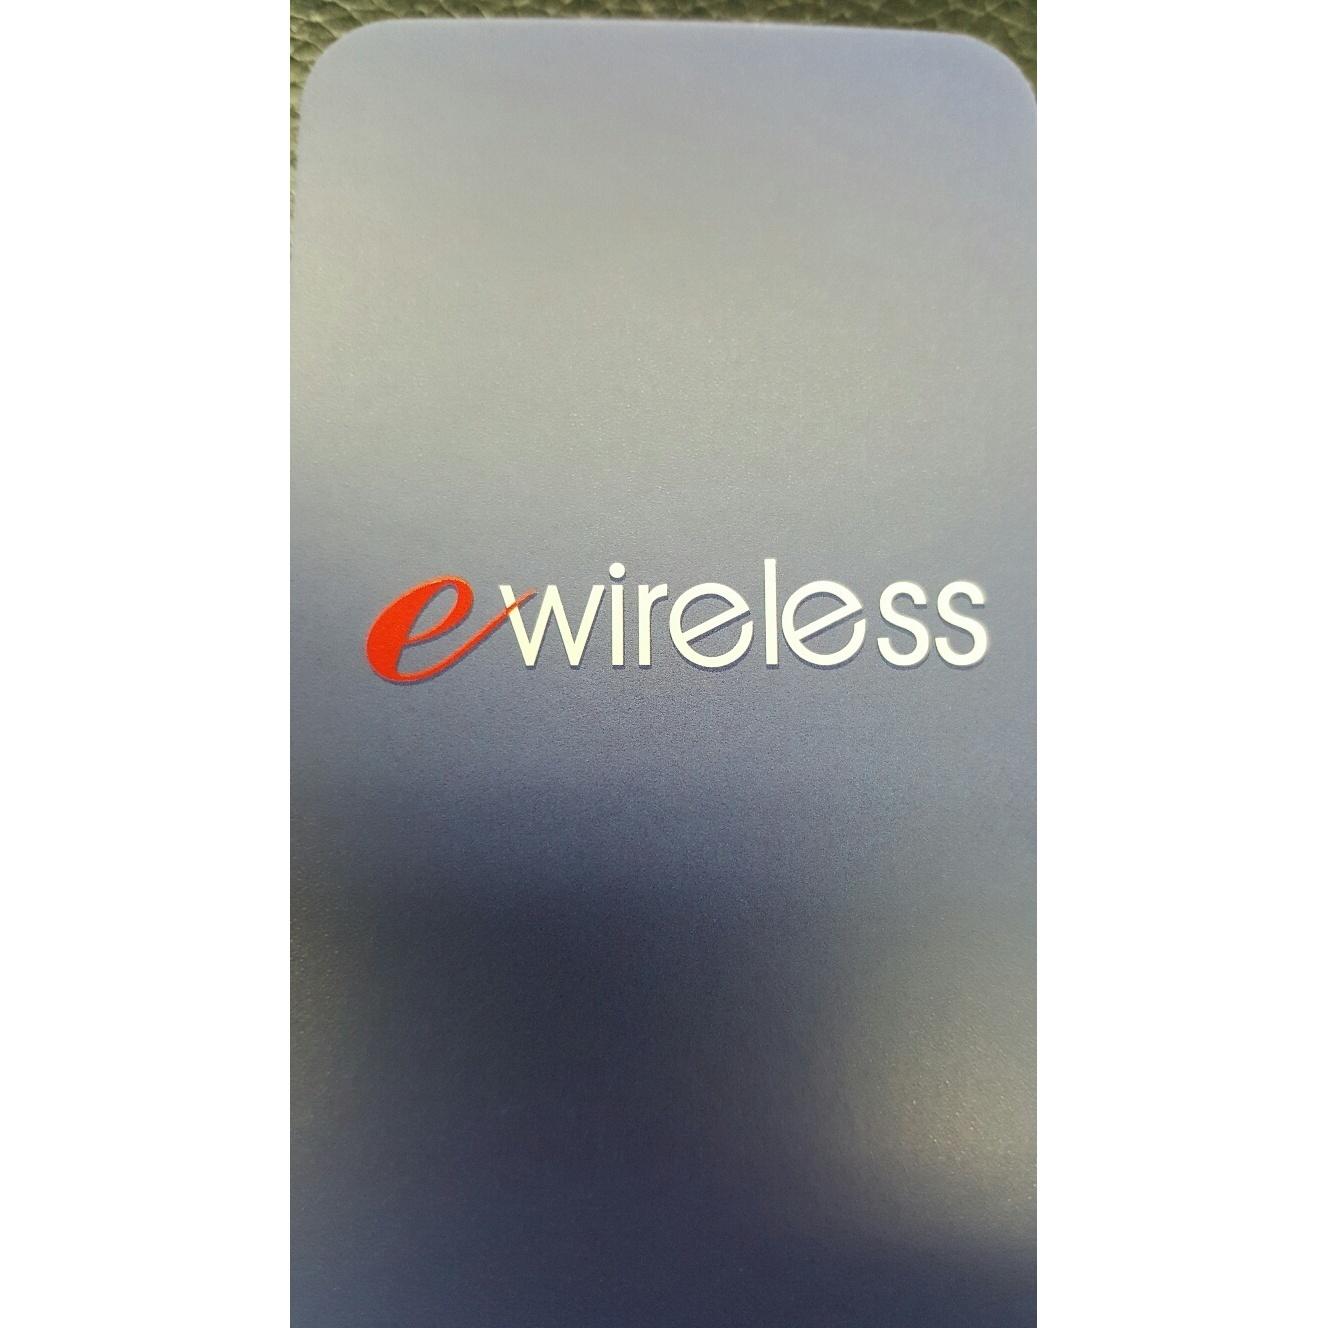 eWireless